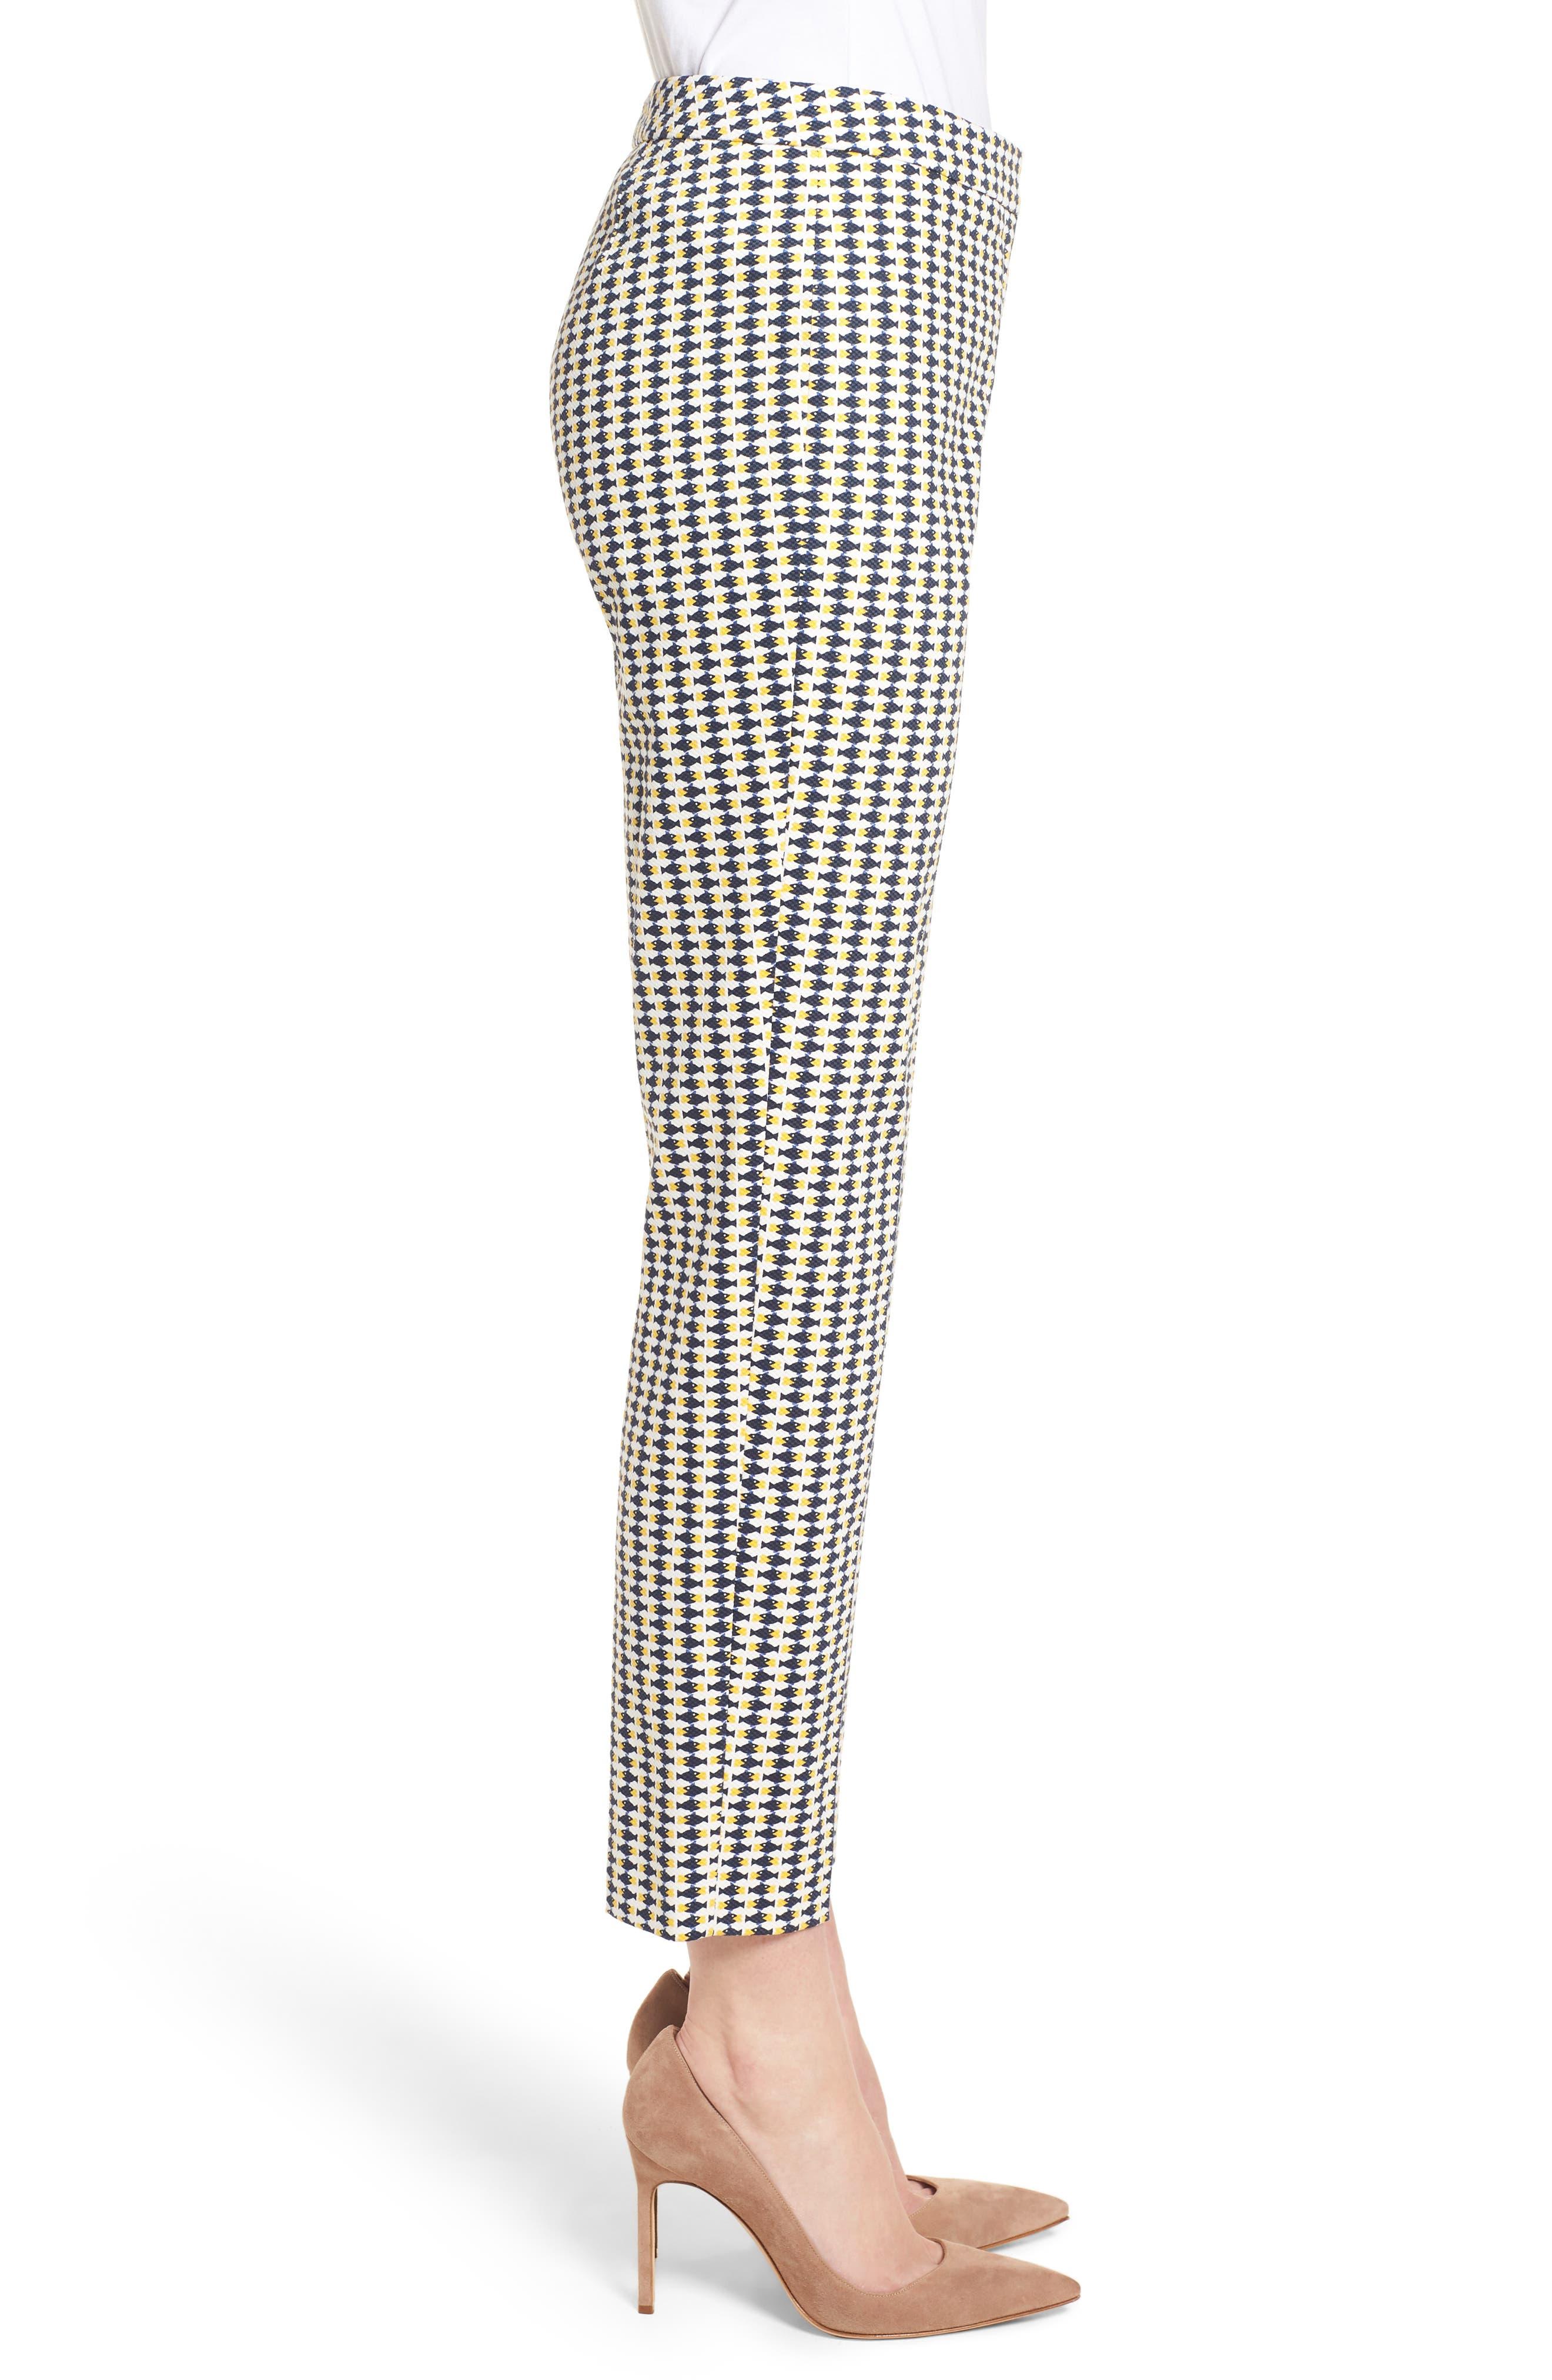 Tiluna6 Heartfish Slim Ankle Trousers,                             Alternate thumbnail 3, color,                             186